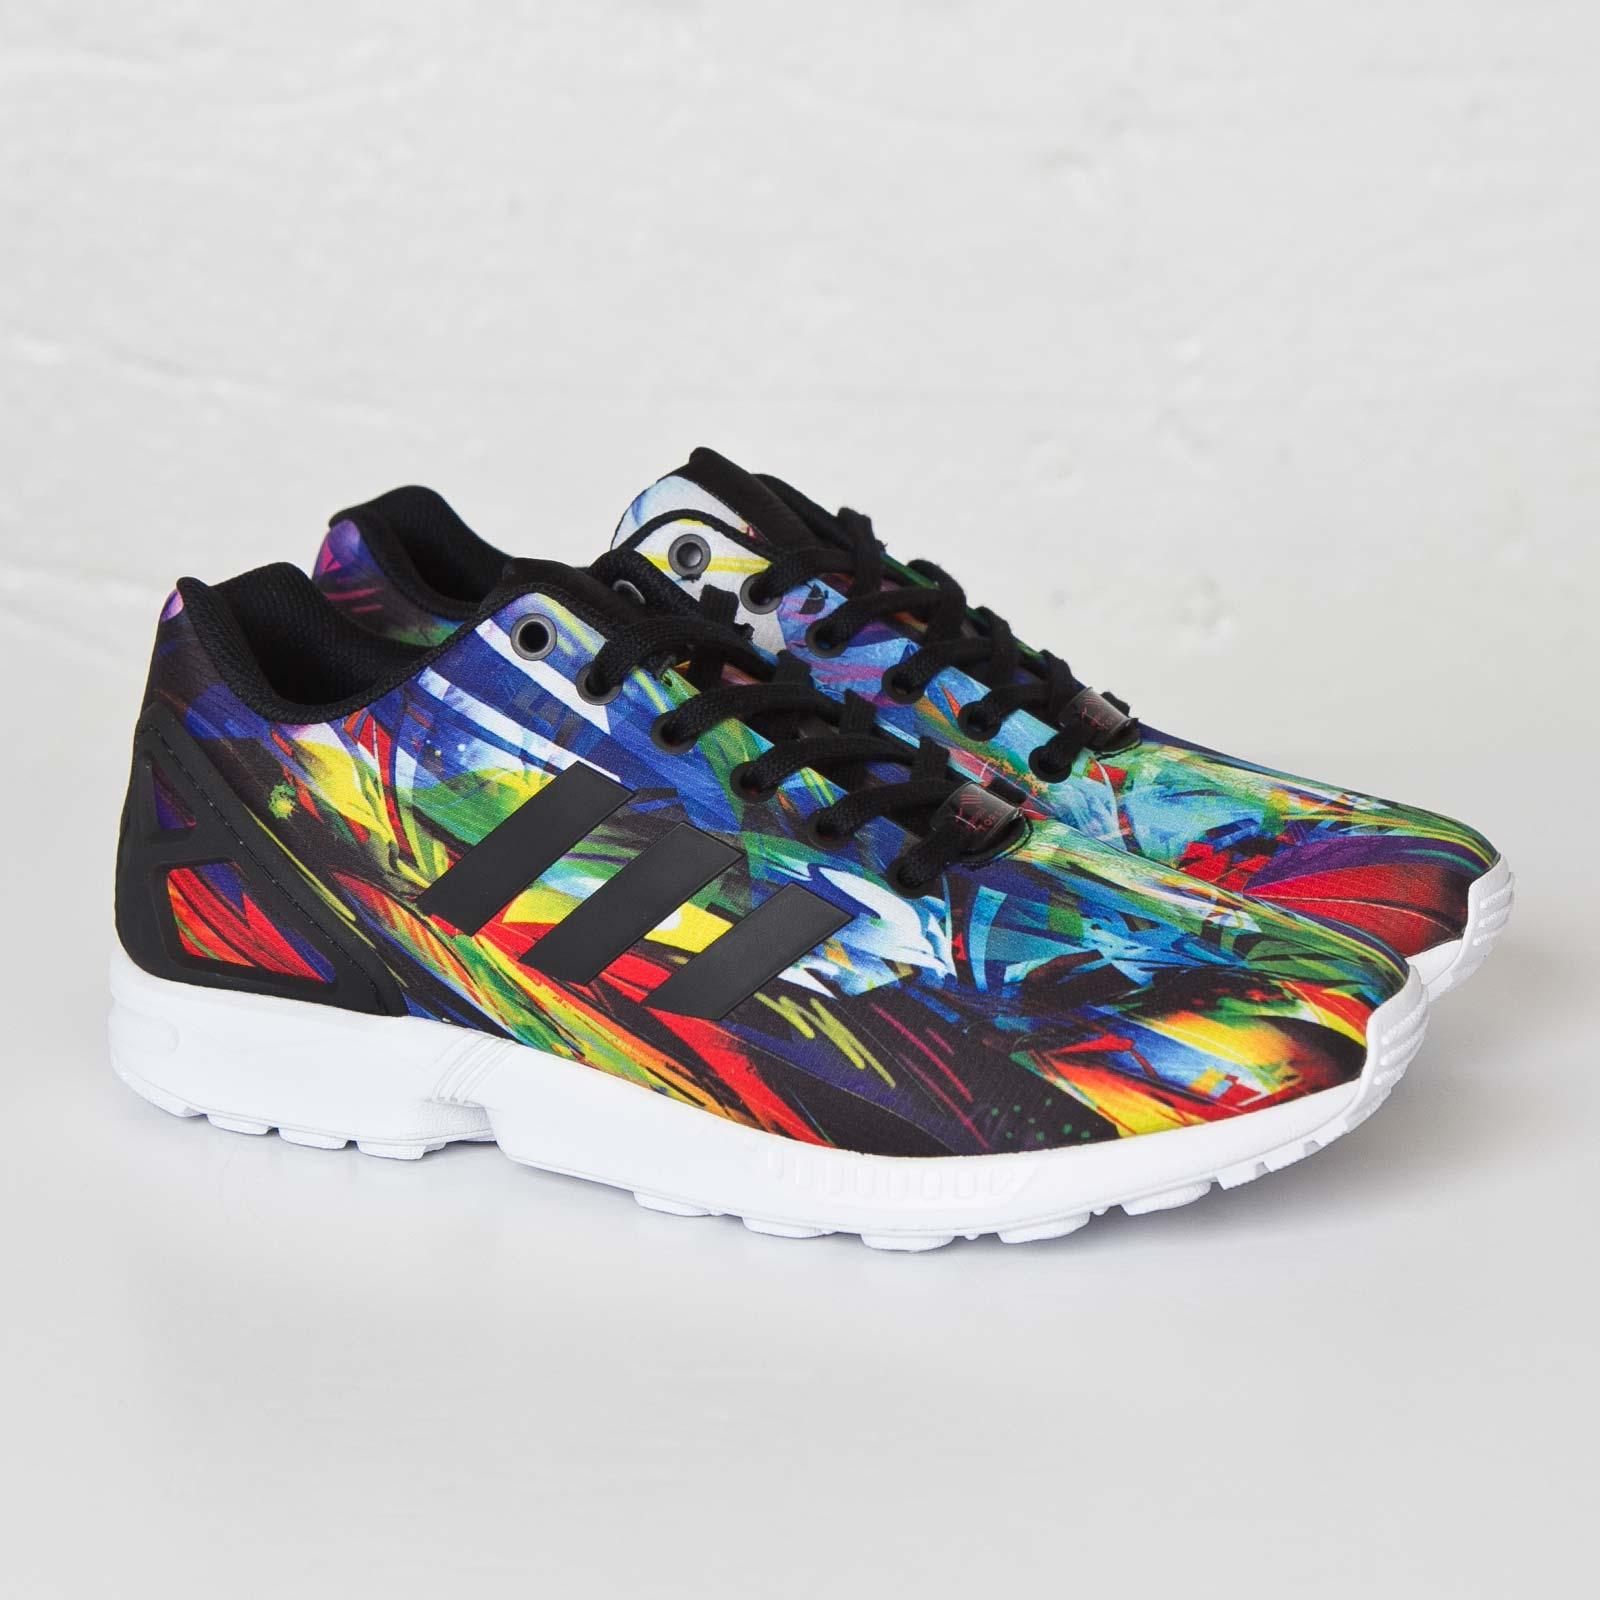 newest b6b60 a188b adidas ZX Flux - Af6323 - Sneakersnstuff | sneakers ...